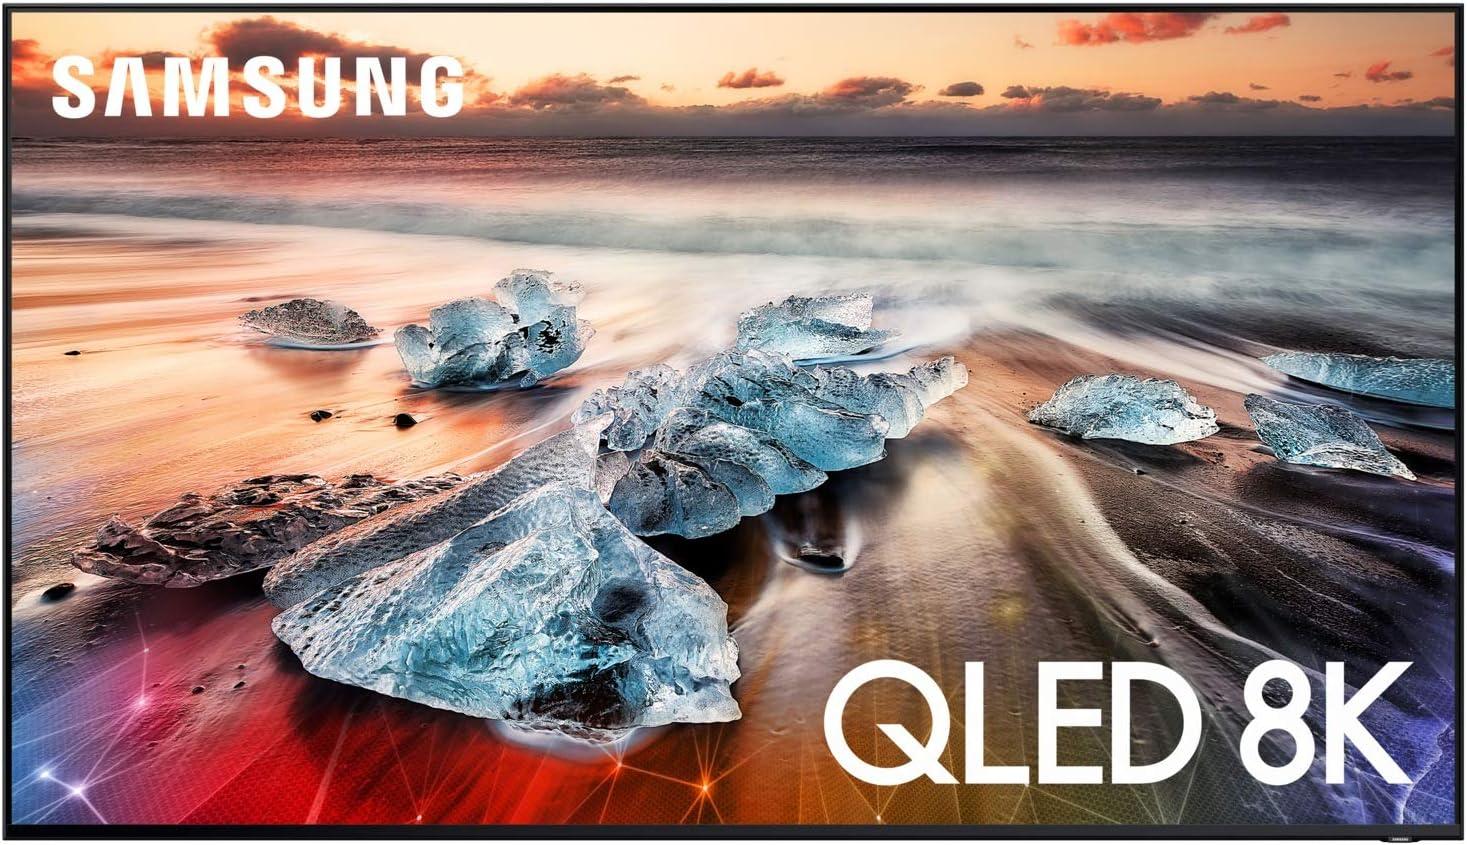 Samsung QP82R-8K QLED (7680x4320 8K UHD, Tizen OS, HDMI, USB, LAN): Amazon.es: Electrónica